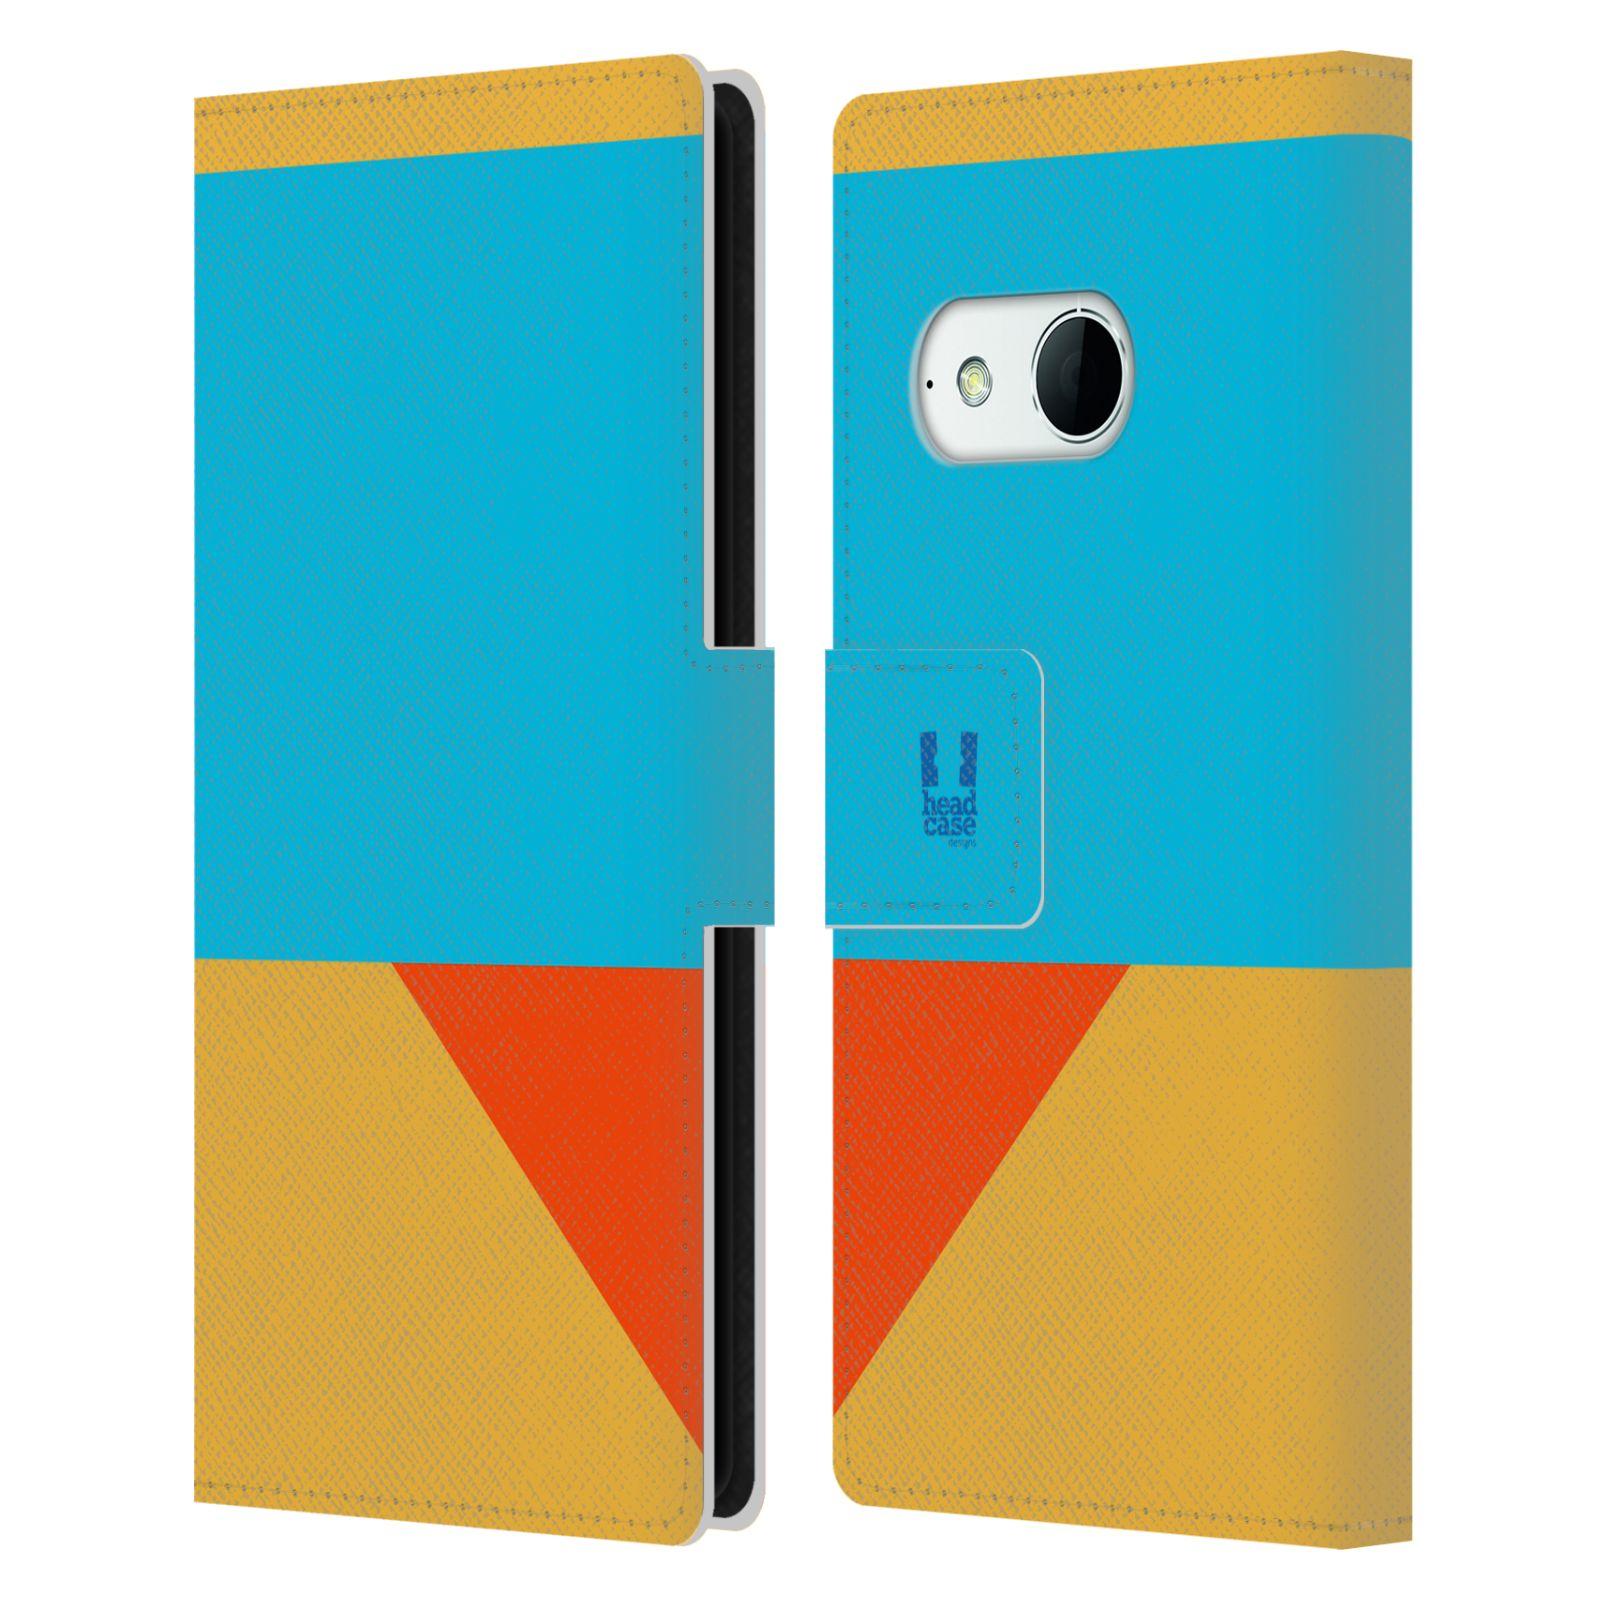 HEAD CASE Flipové pouzdro pro mobil HTC ONE MINI 2 barevné tvary béžová a modrá DAY WEAR